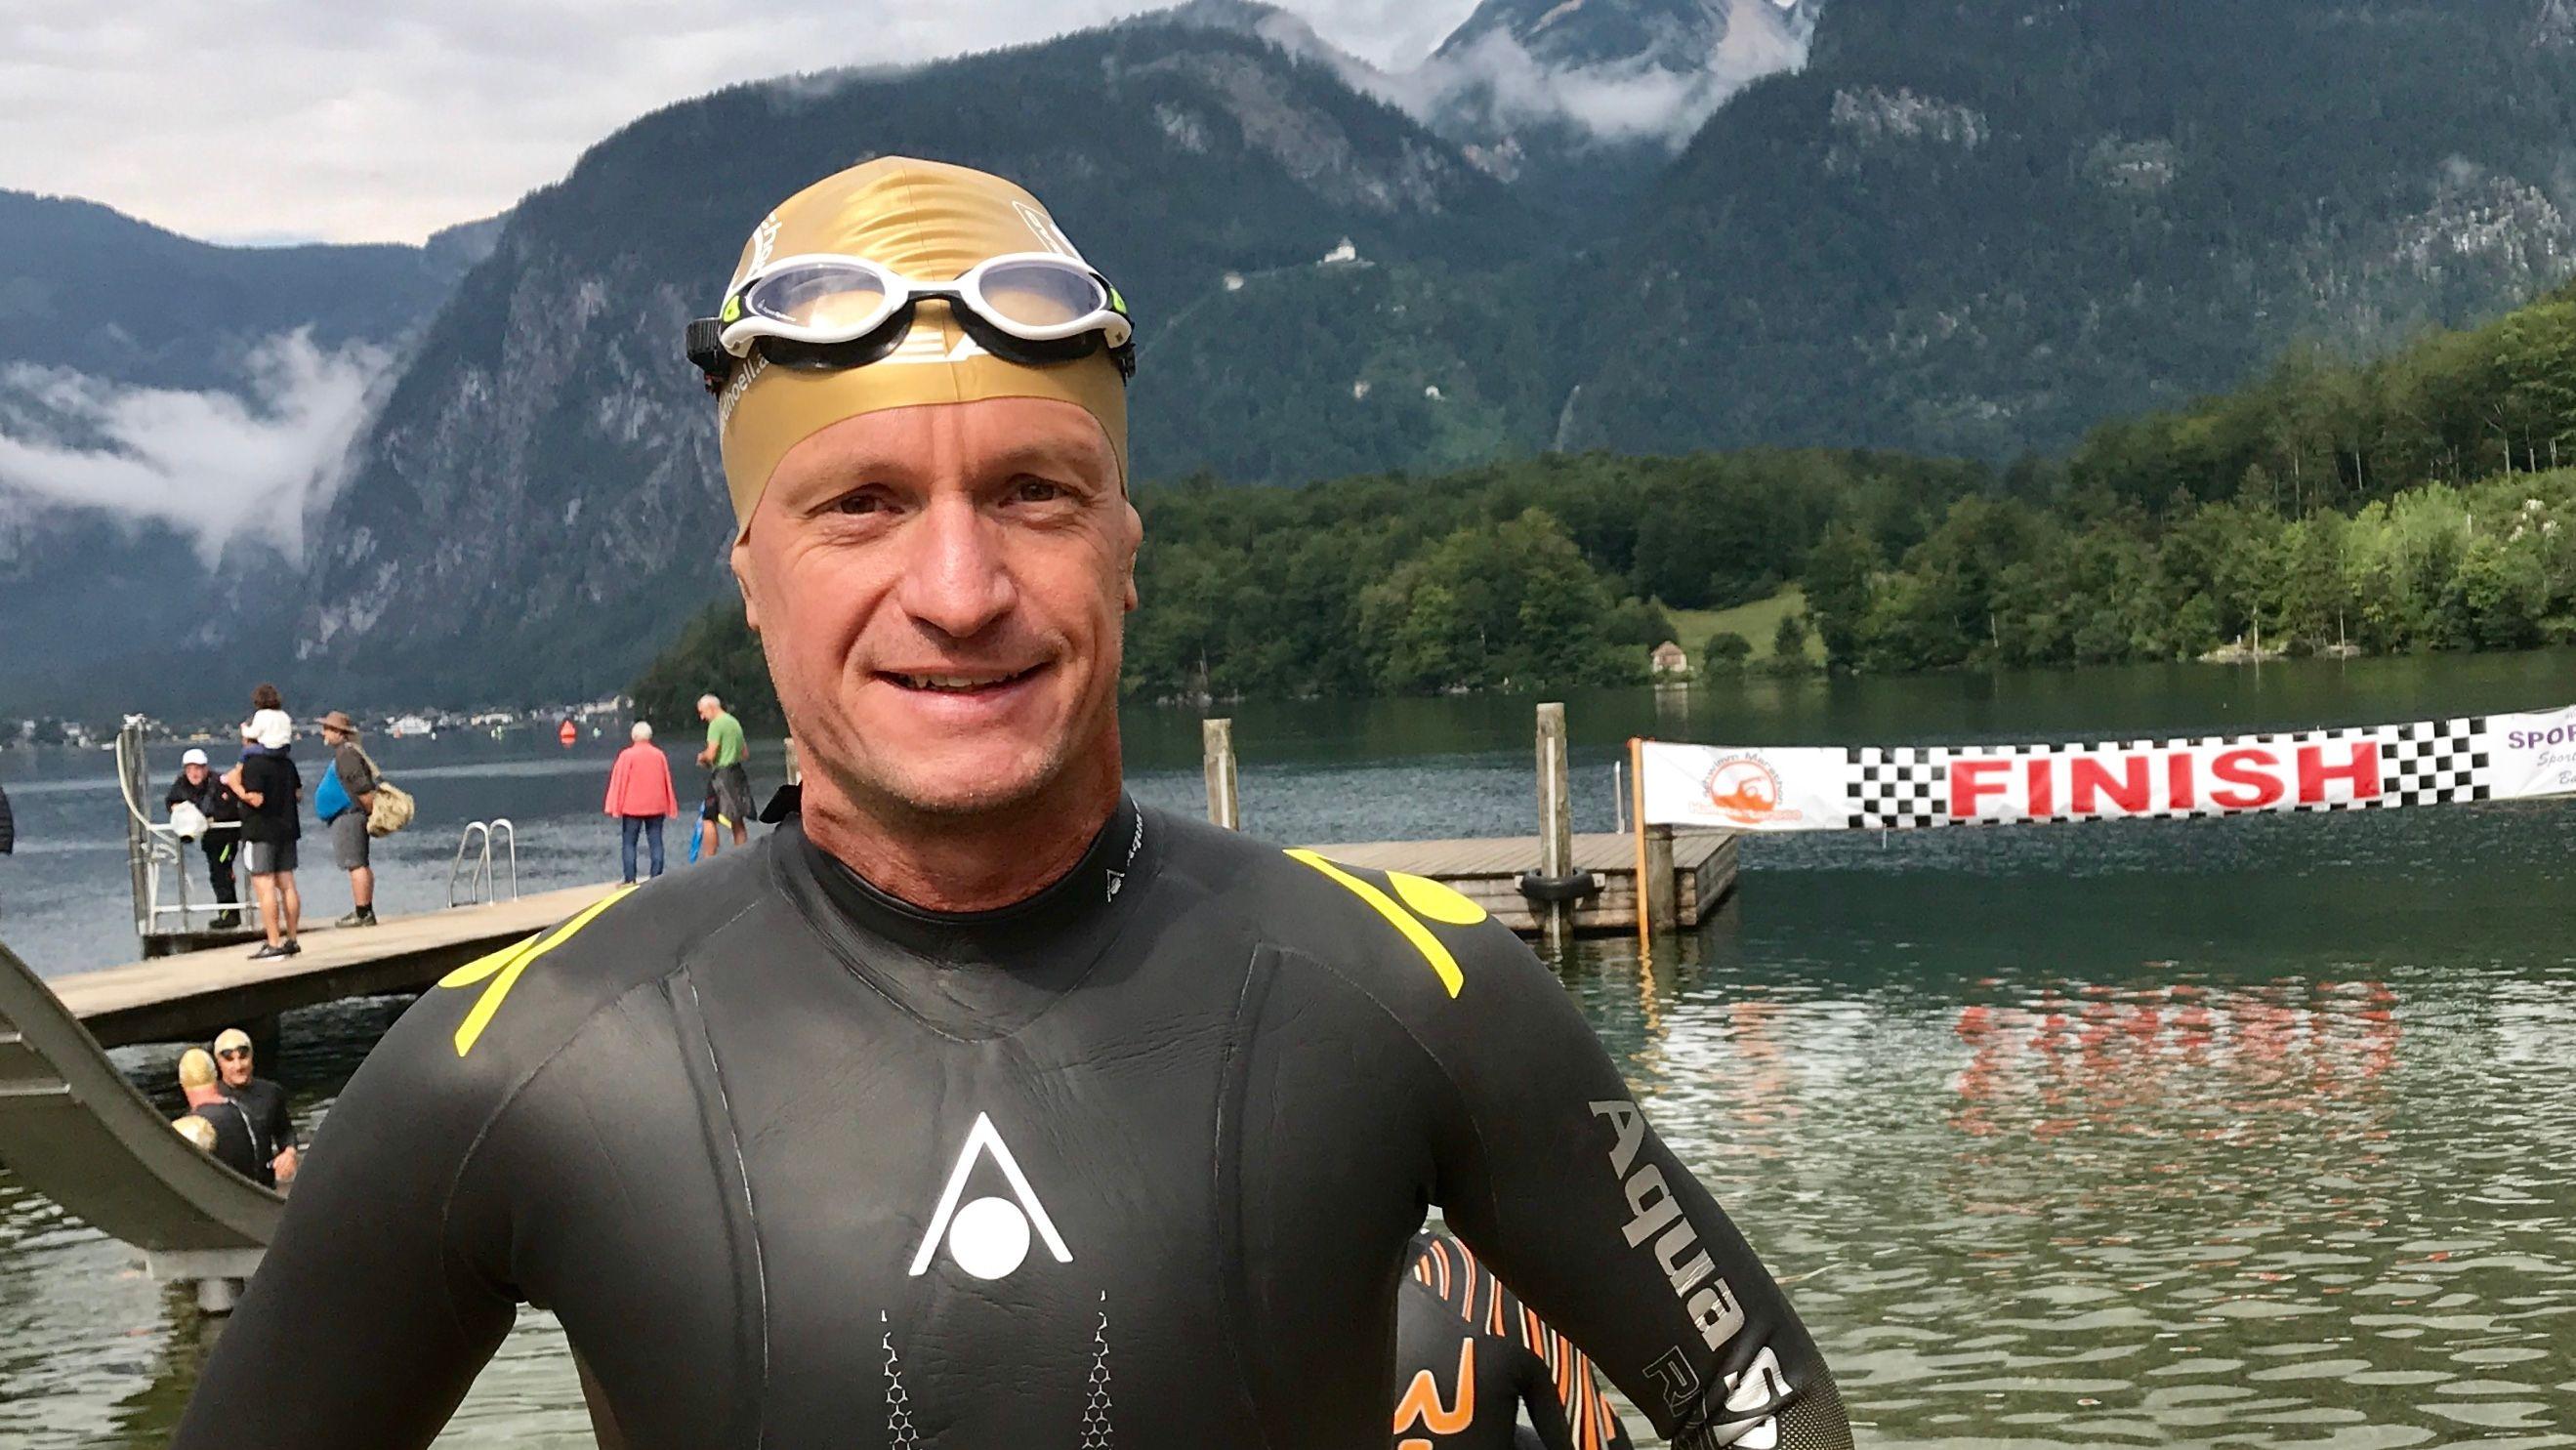 Fitnessmagazin-Reporter Bernd-Uwe Gutknecht